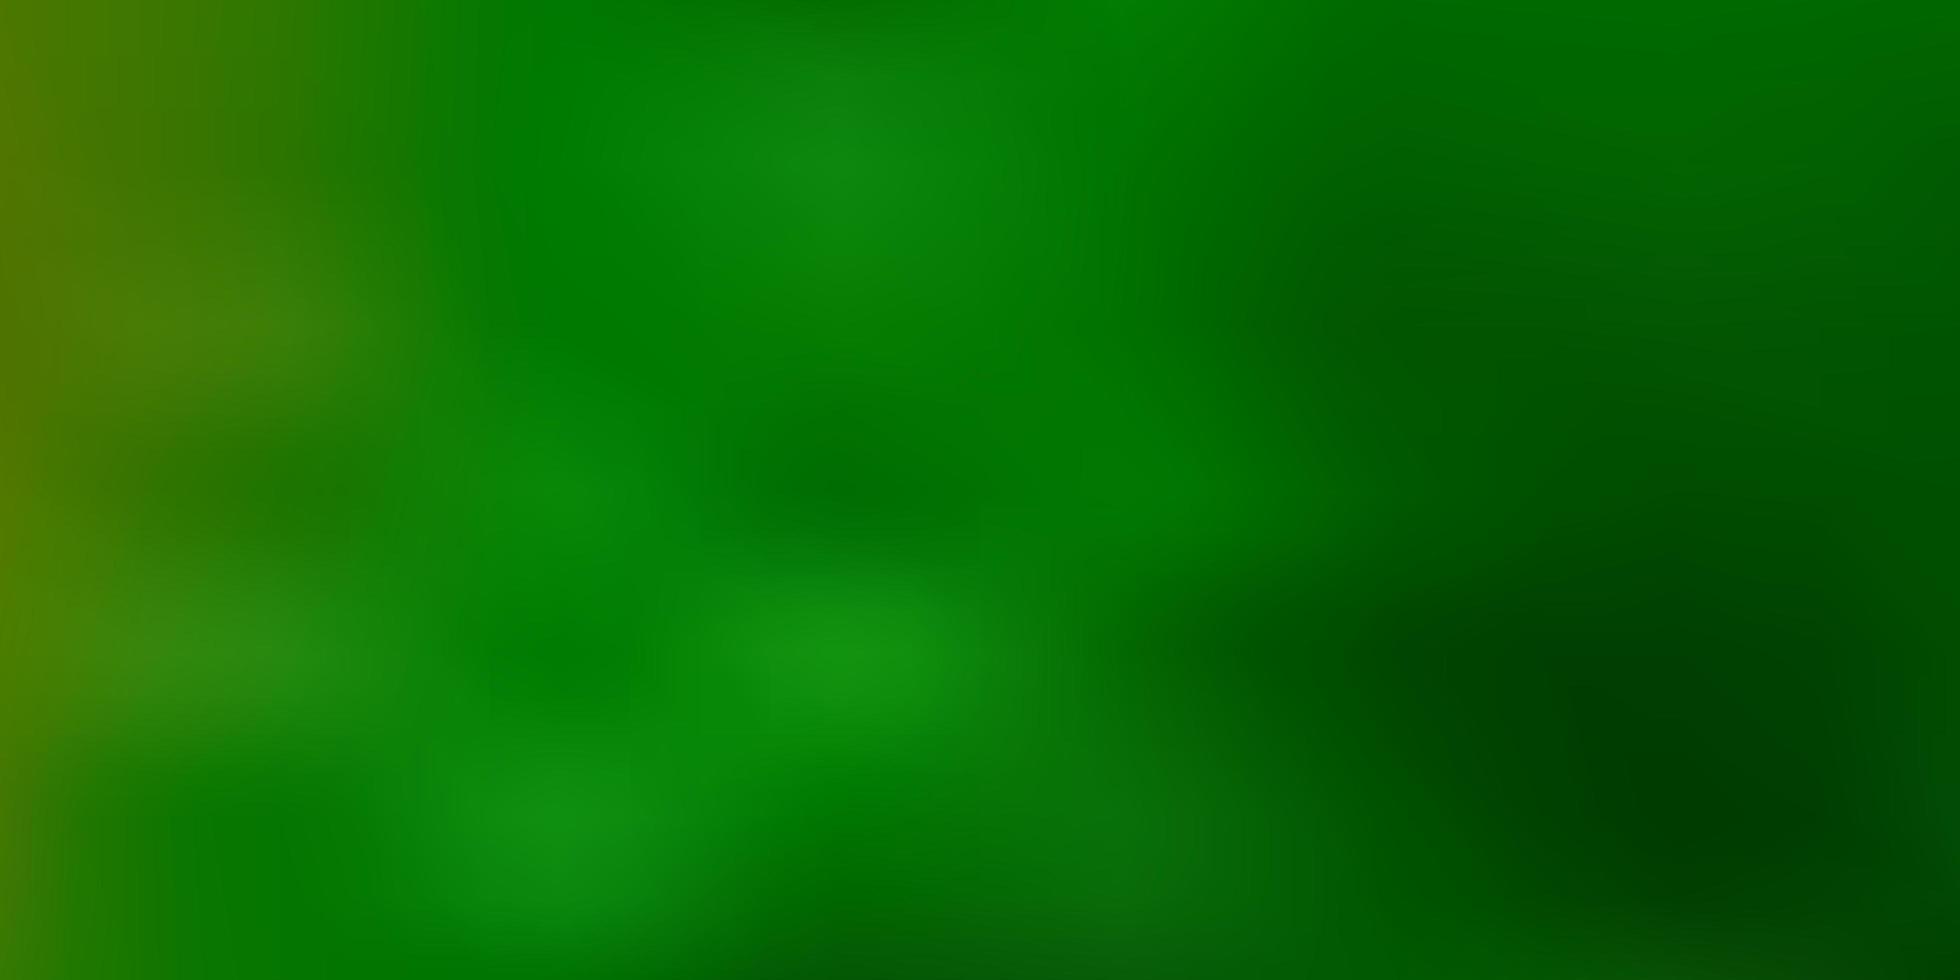 Light green abstract blur background. vector